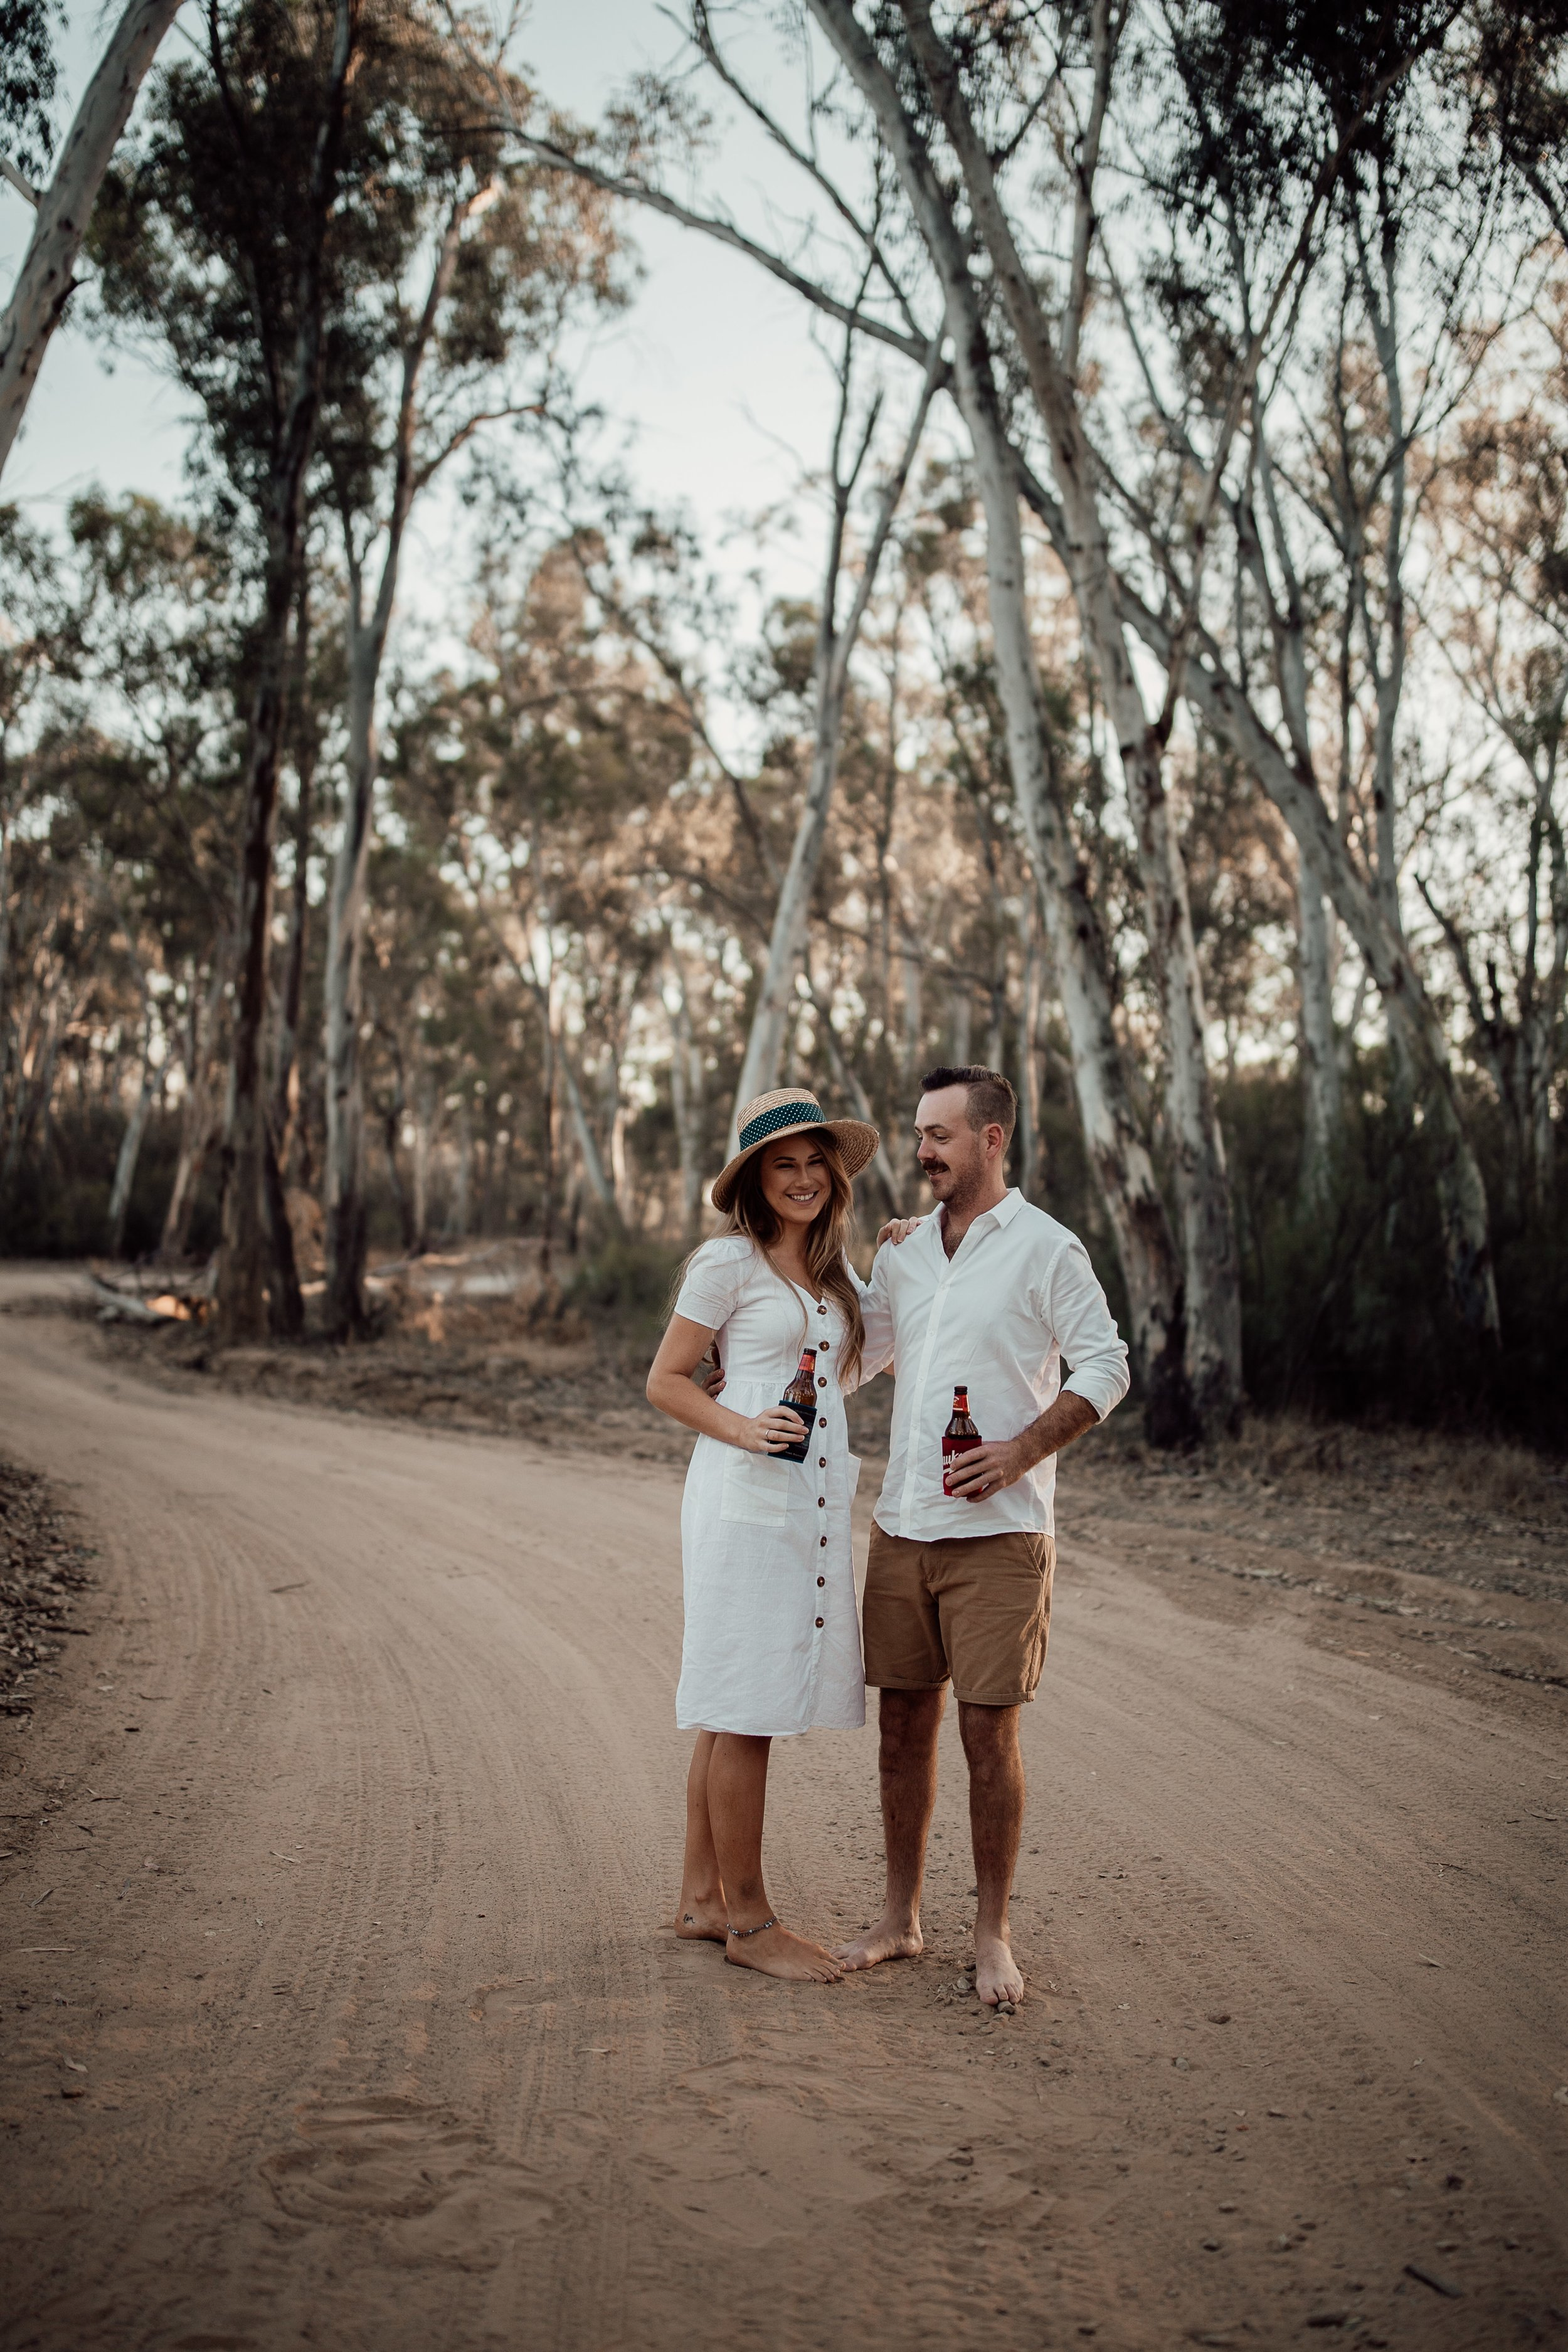 mickalathomas_puremacphotography_weddingphotographer_couplephotographer_Sheppartonphotographer_2806.jpg